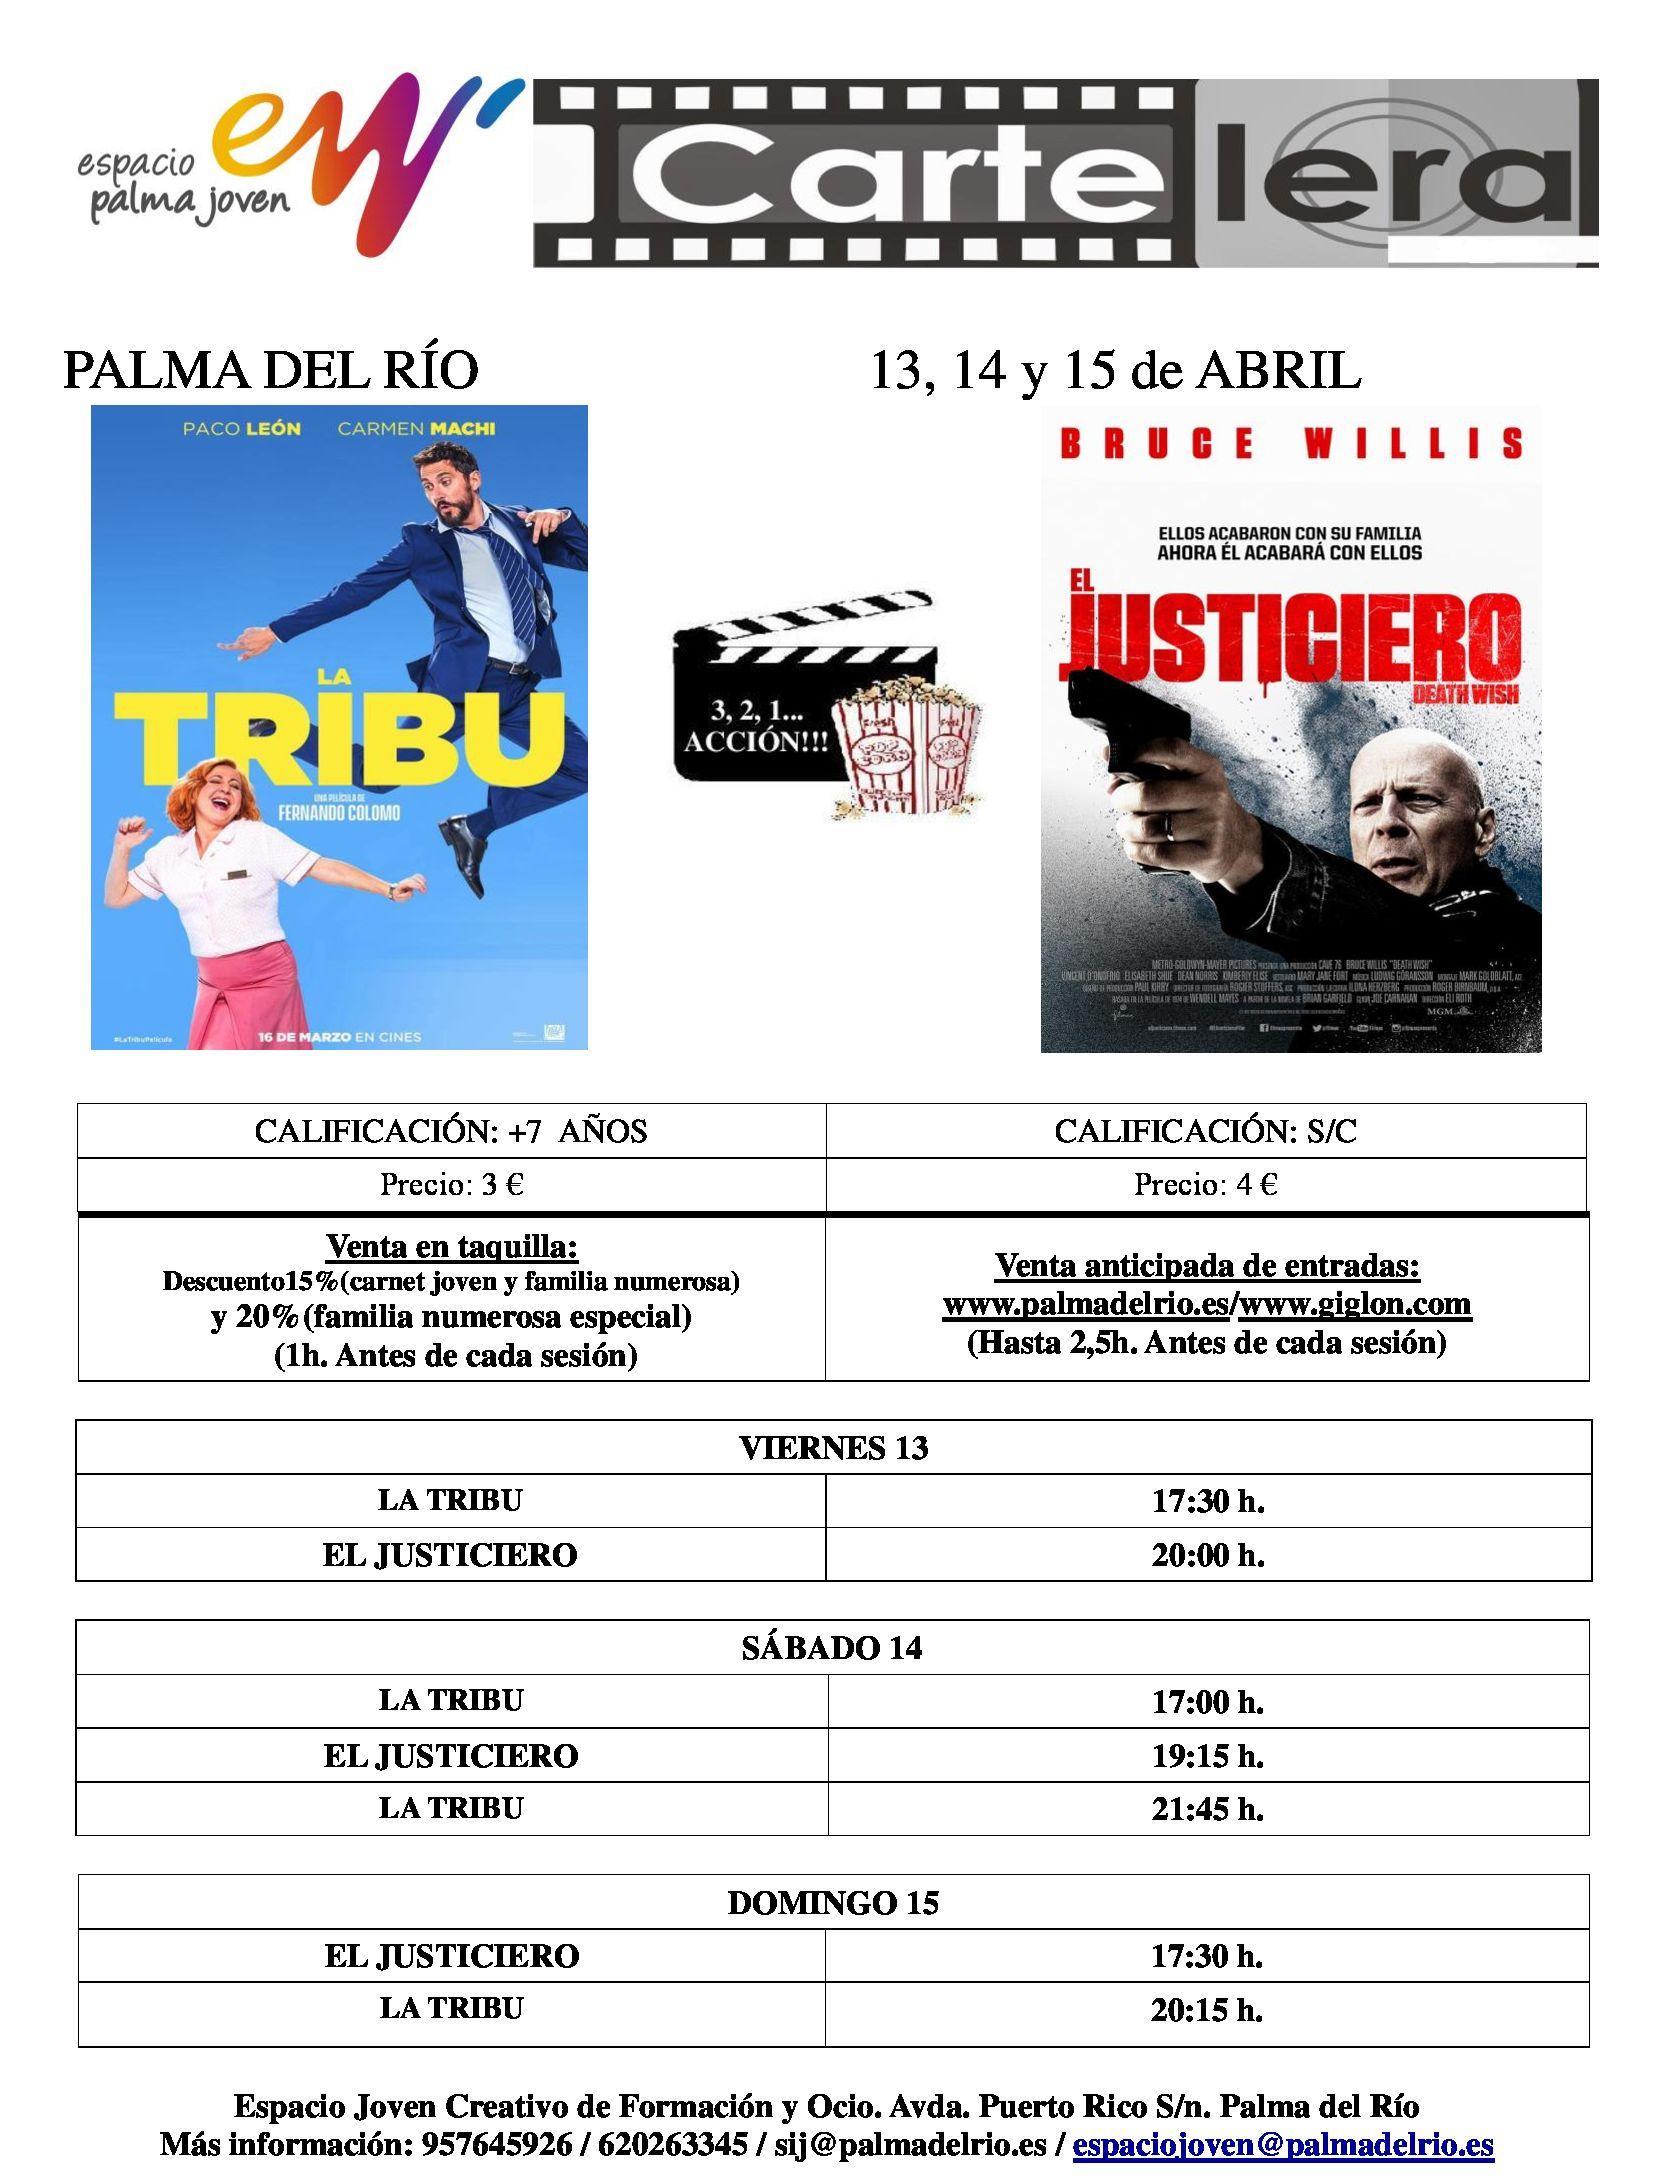 https://www.palmadelrio.es/sites/default/files/cartelera_13.14.15_abril_2018.jpg